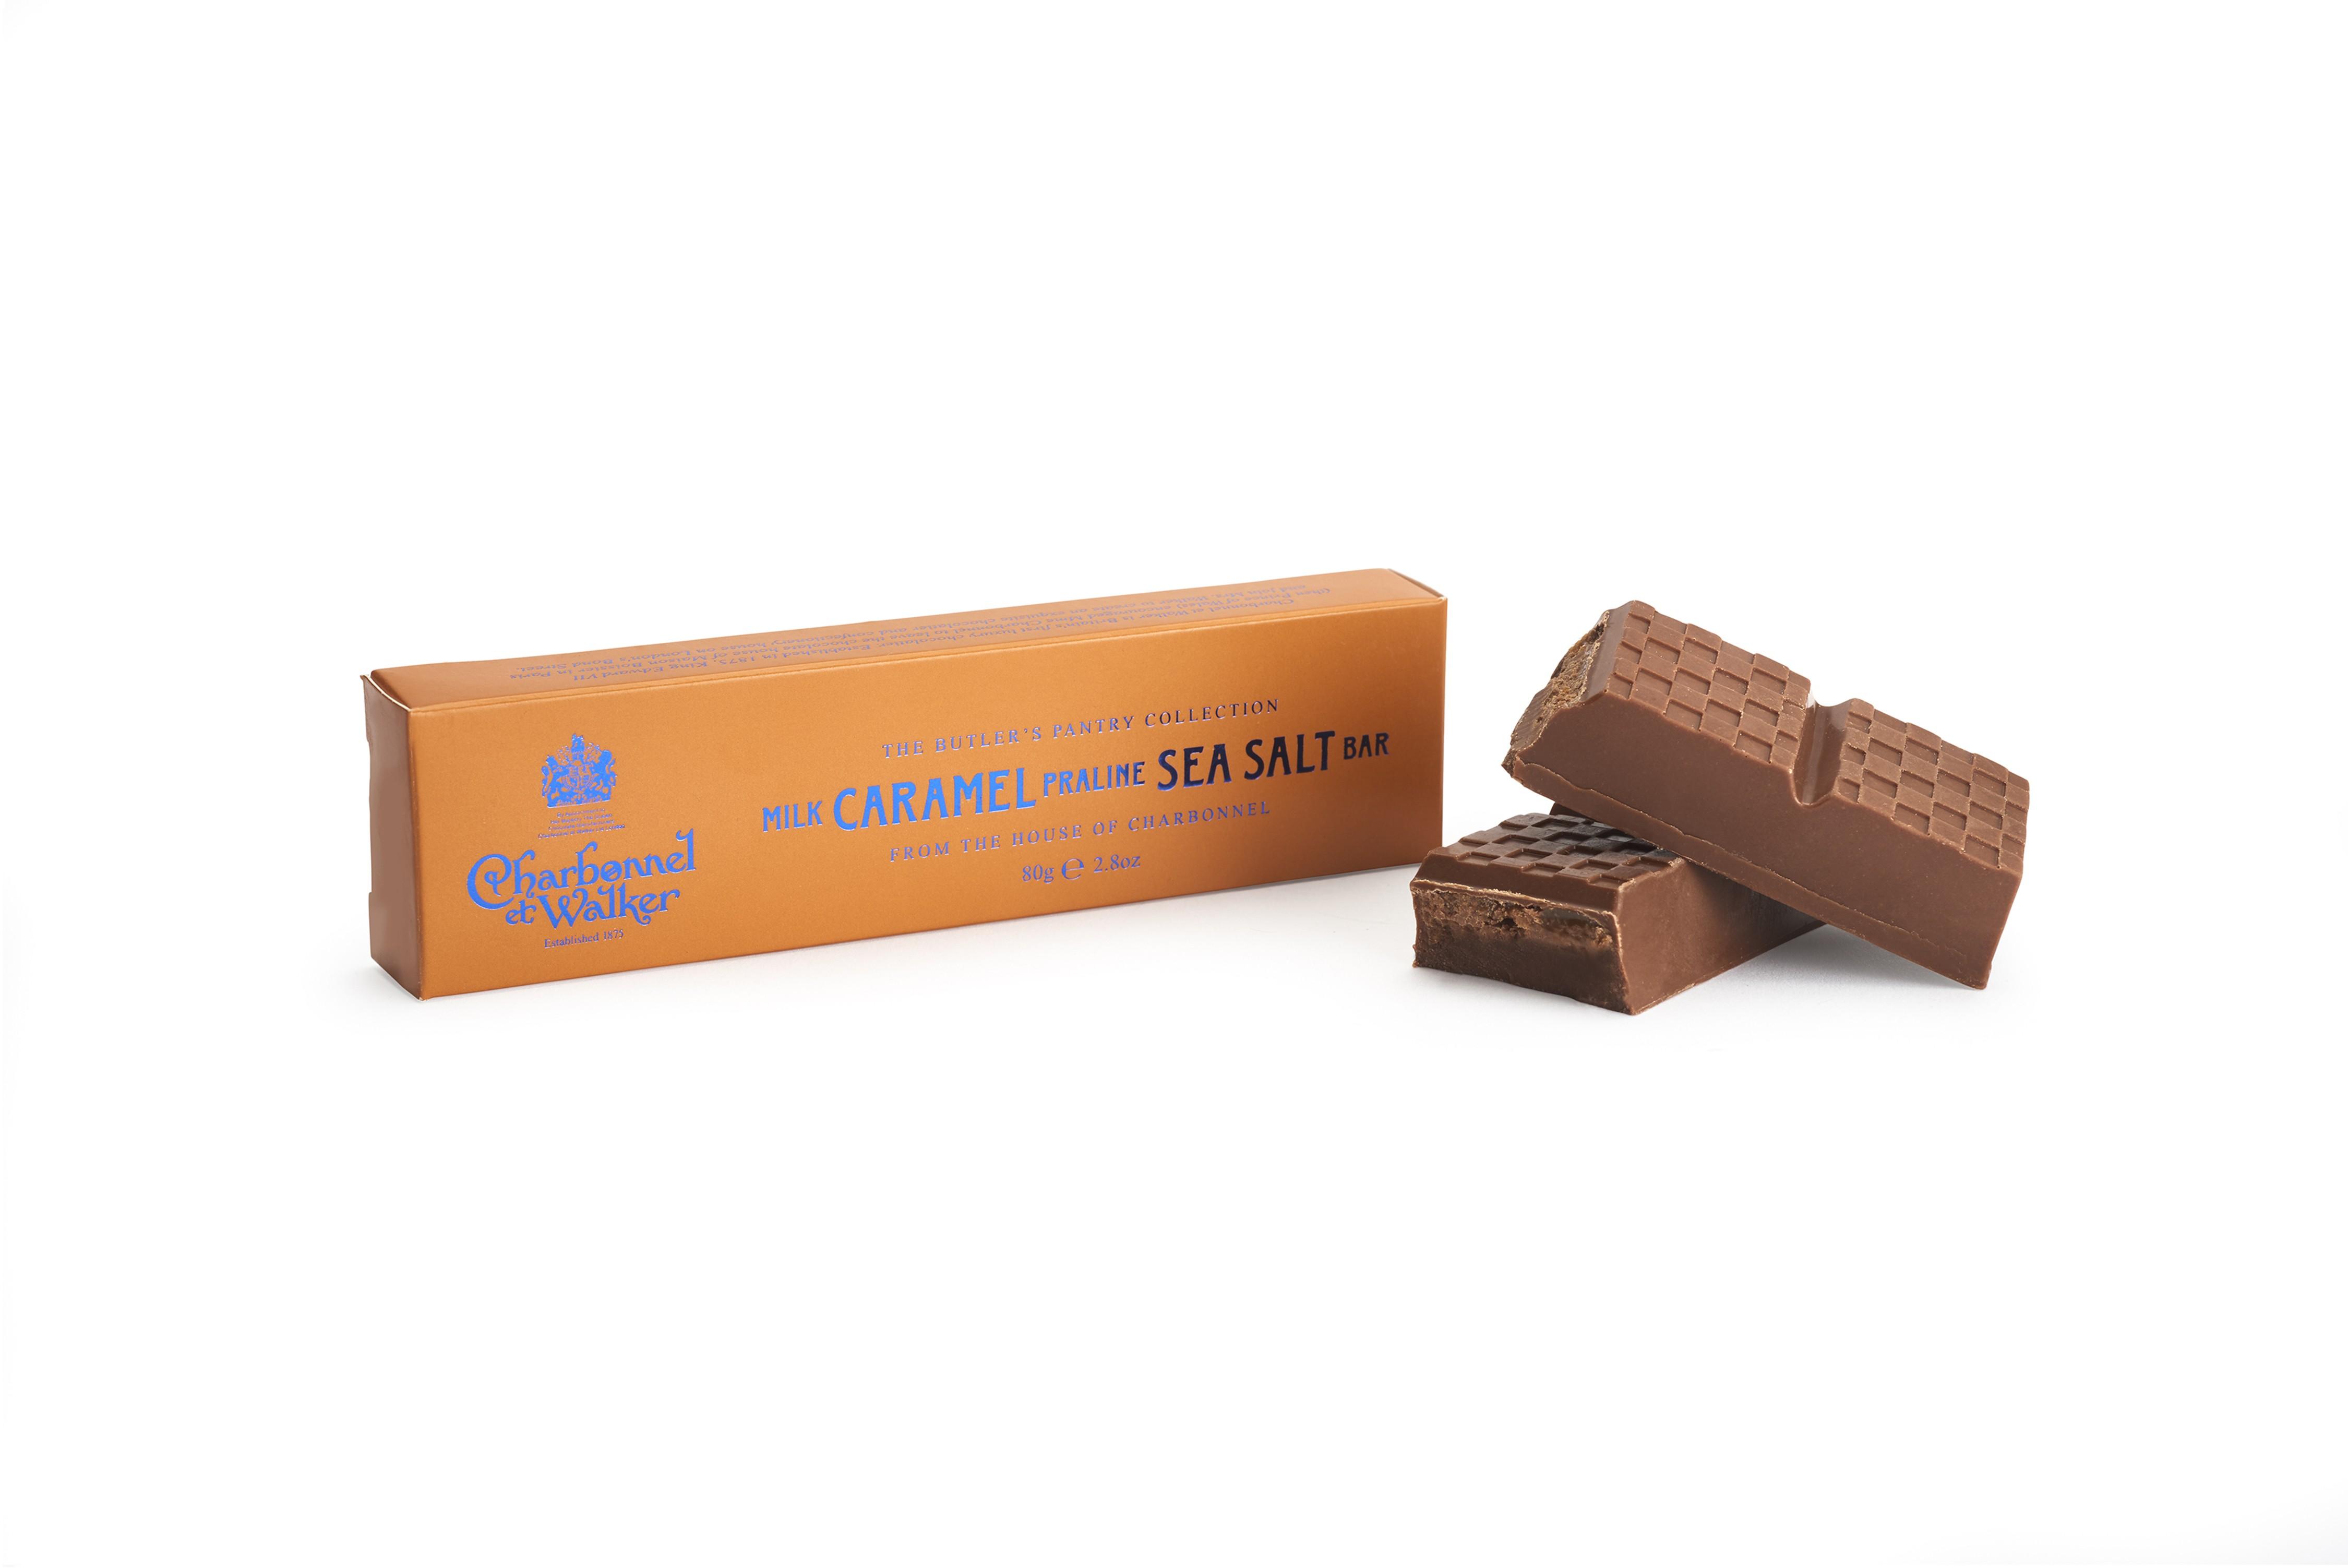 Charbonnel et Walker - Milk Caramel Praline Sea Salt Bar